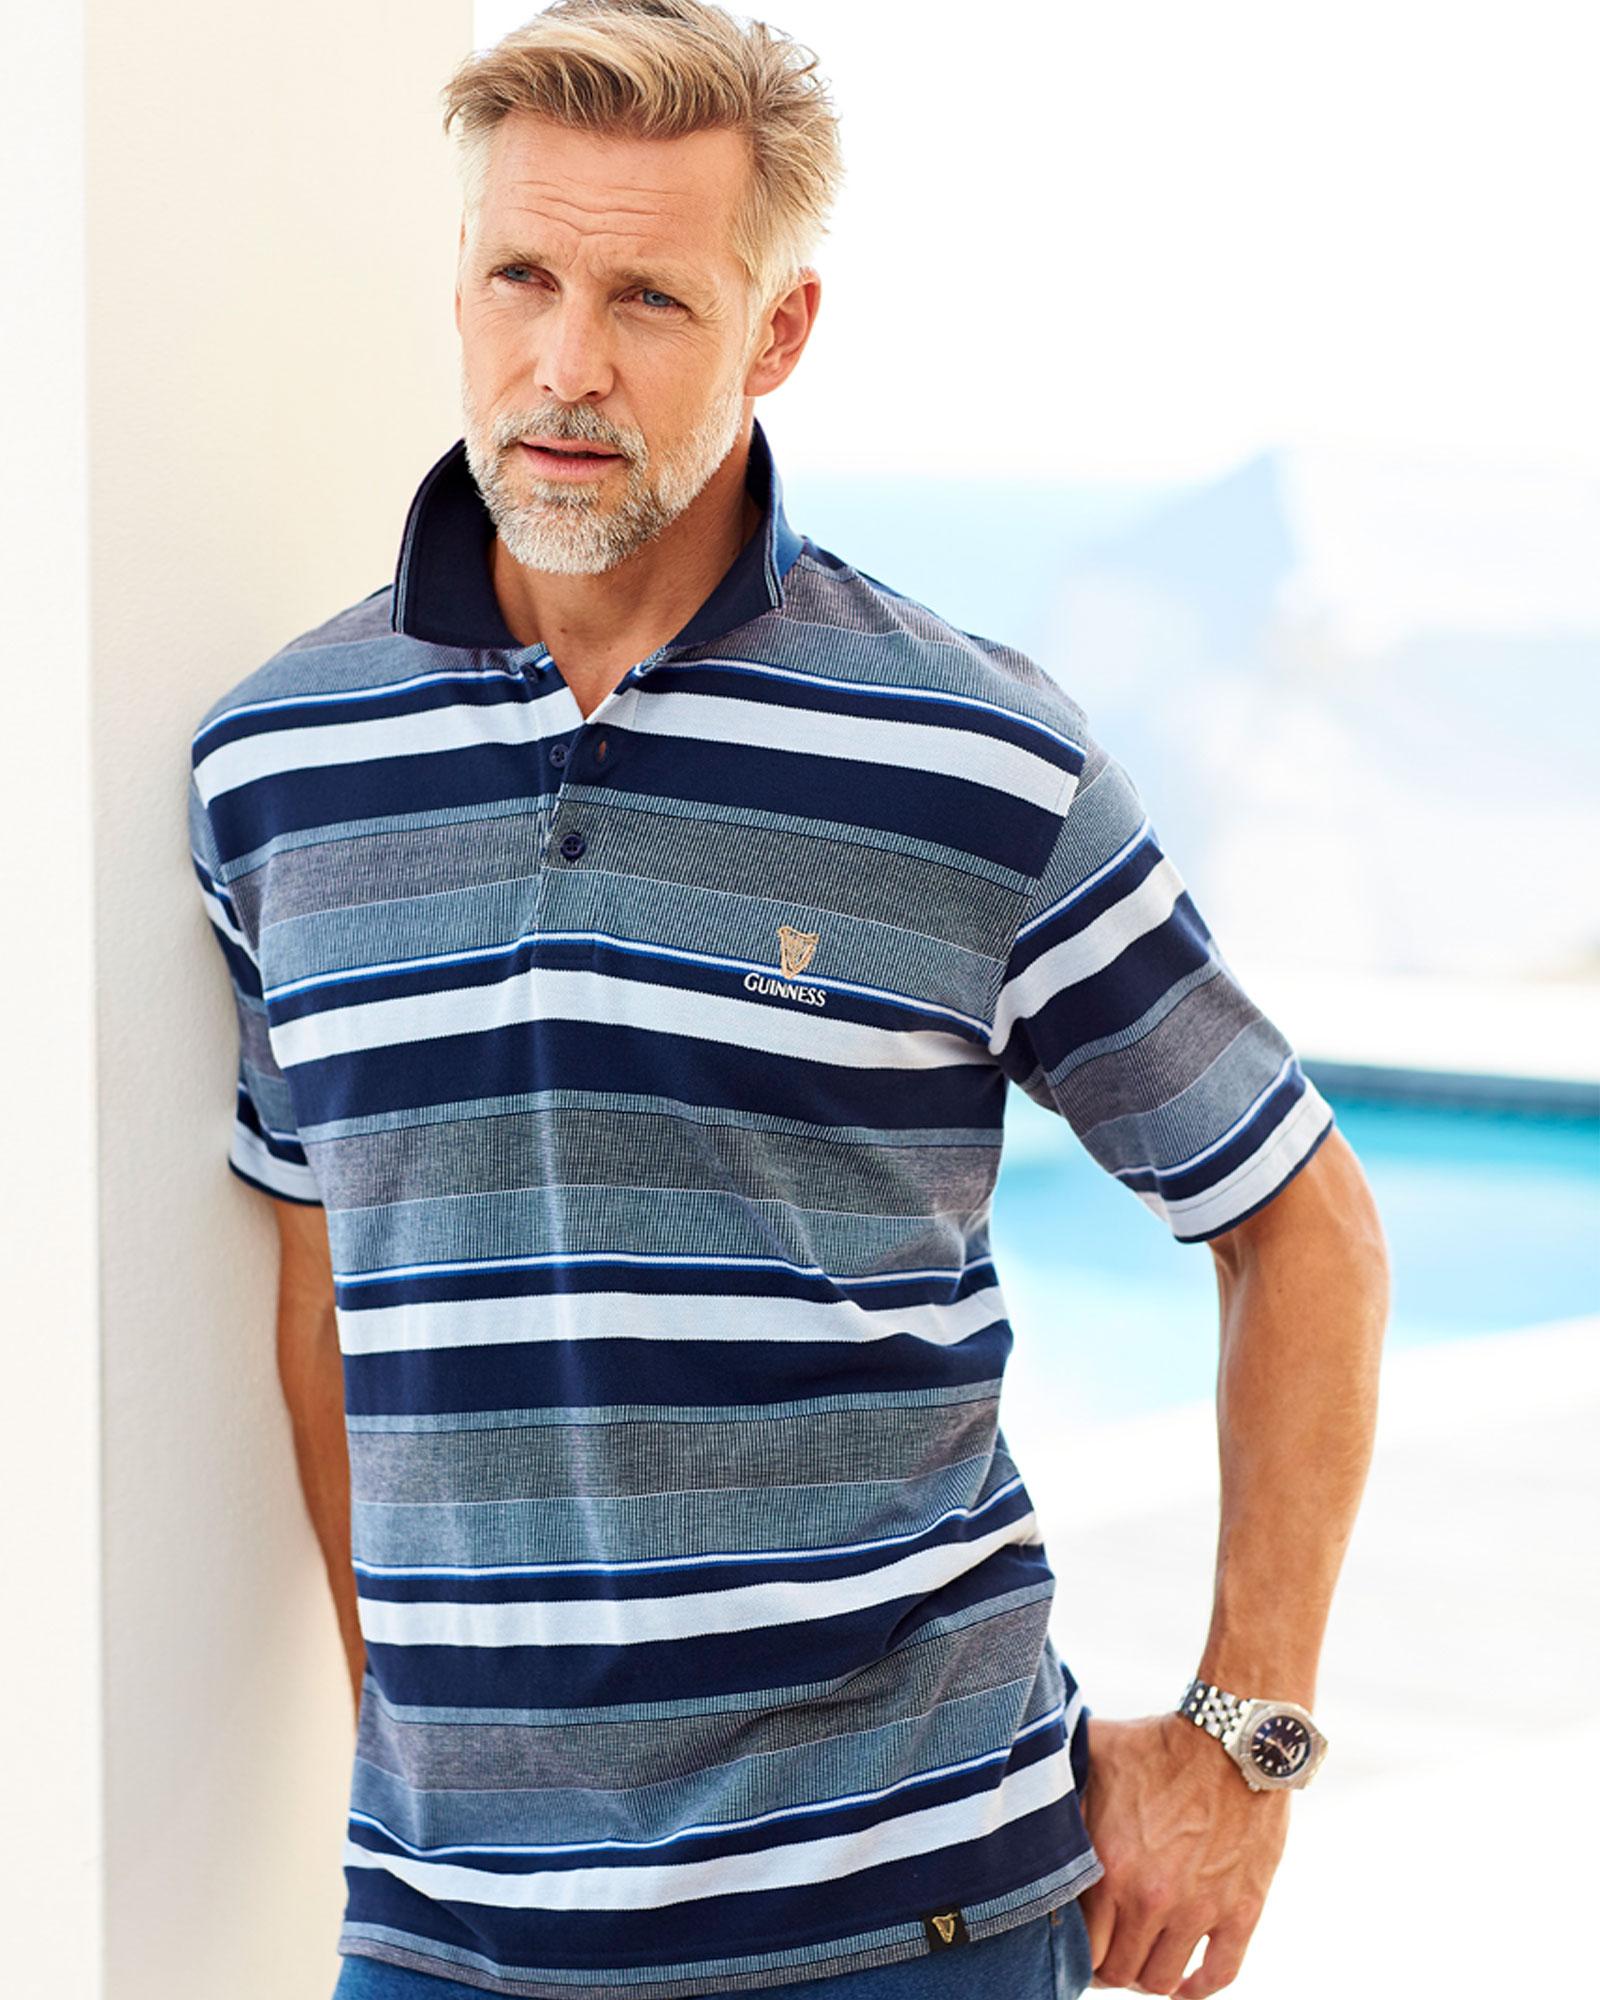 59e386d08e9a Who Makes Good Polo Shirts